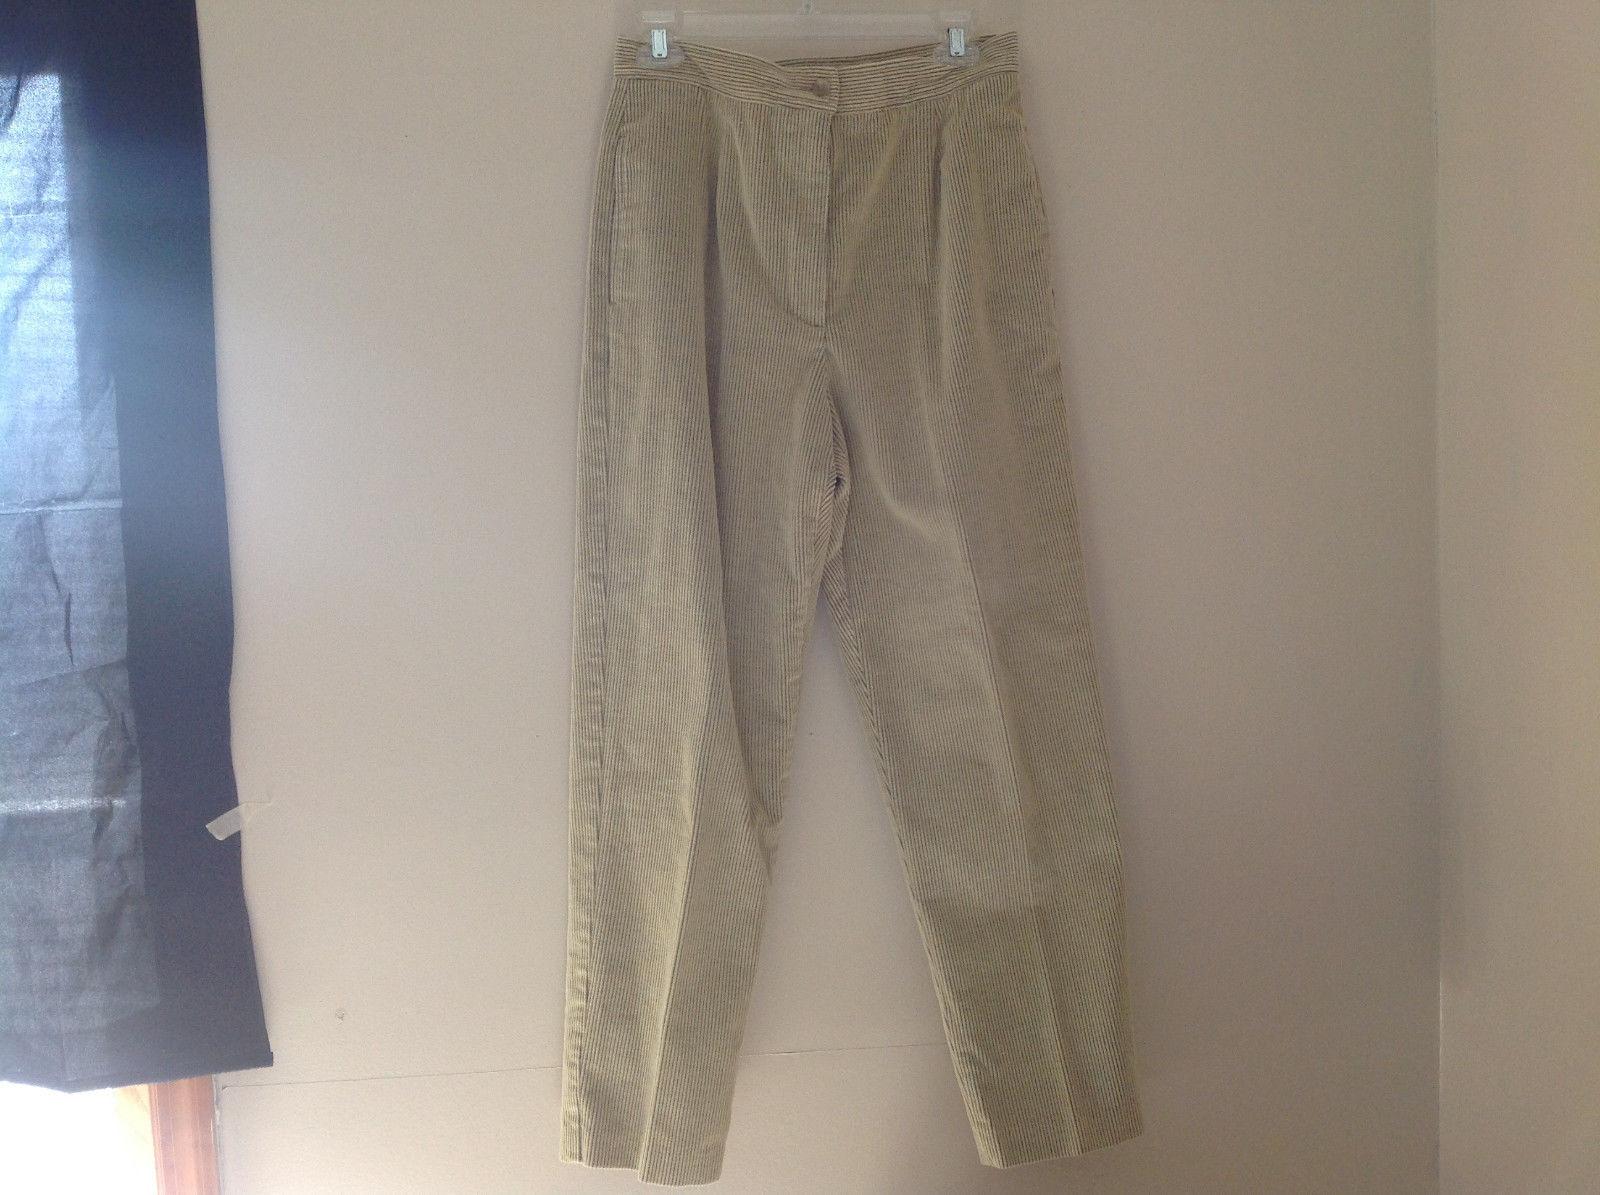 Pale Green Yellow Corduroy Pants Button Zipper Closure Liz Claiborne Size 12